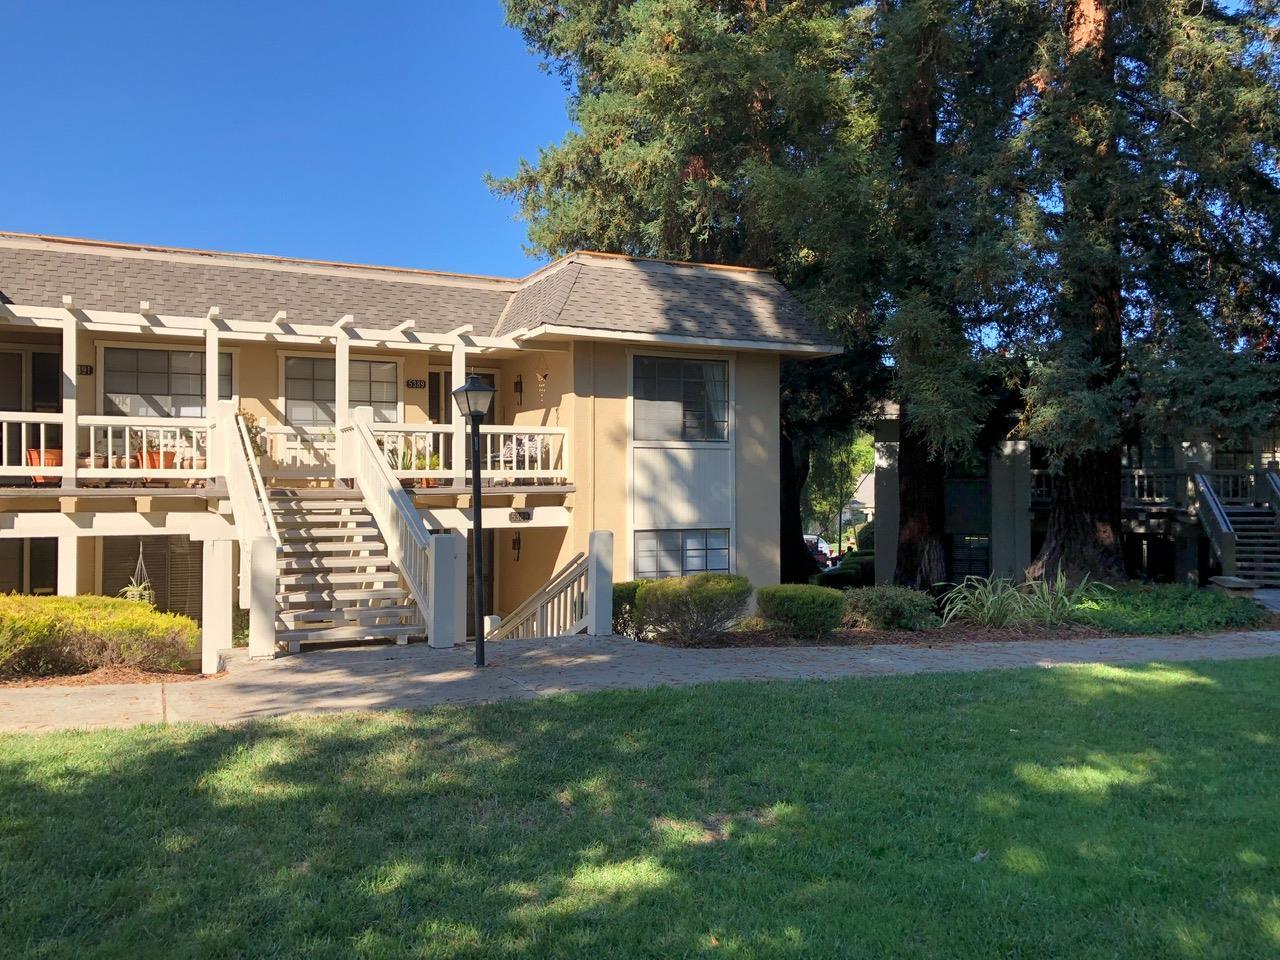 5388 Cribari CRST, Evergreen in Santa Clara County, CA 95135 Home for Sale